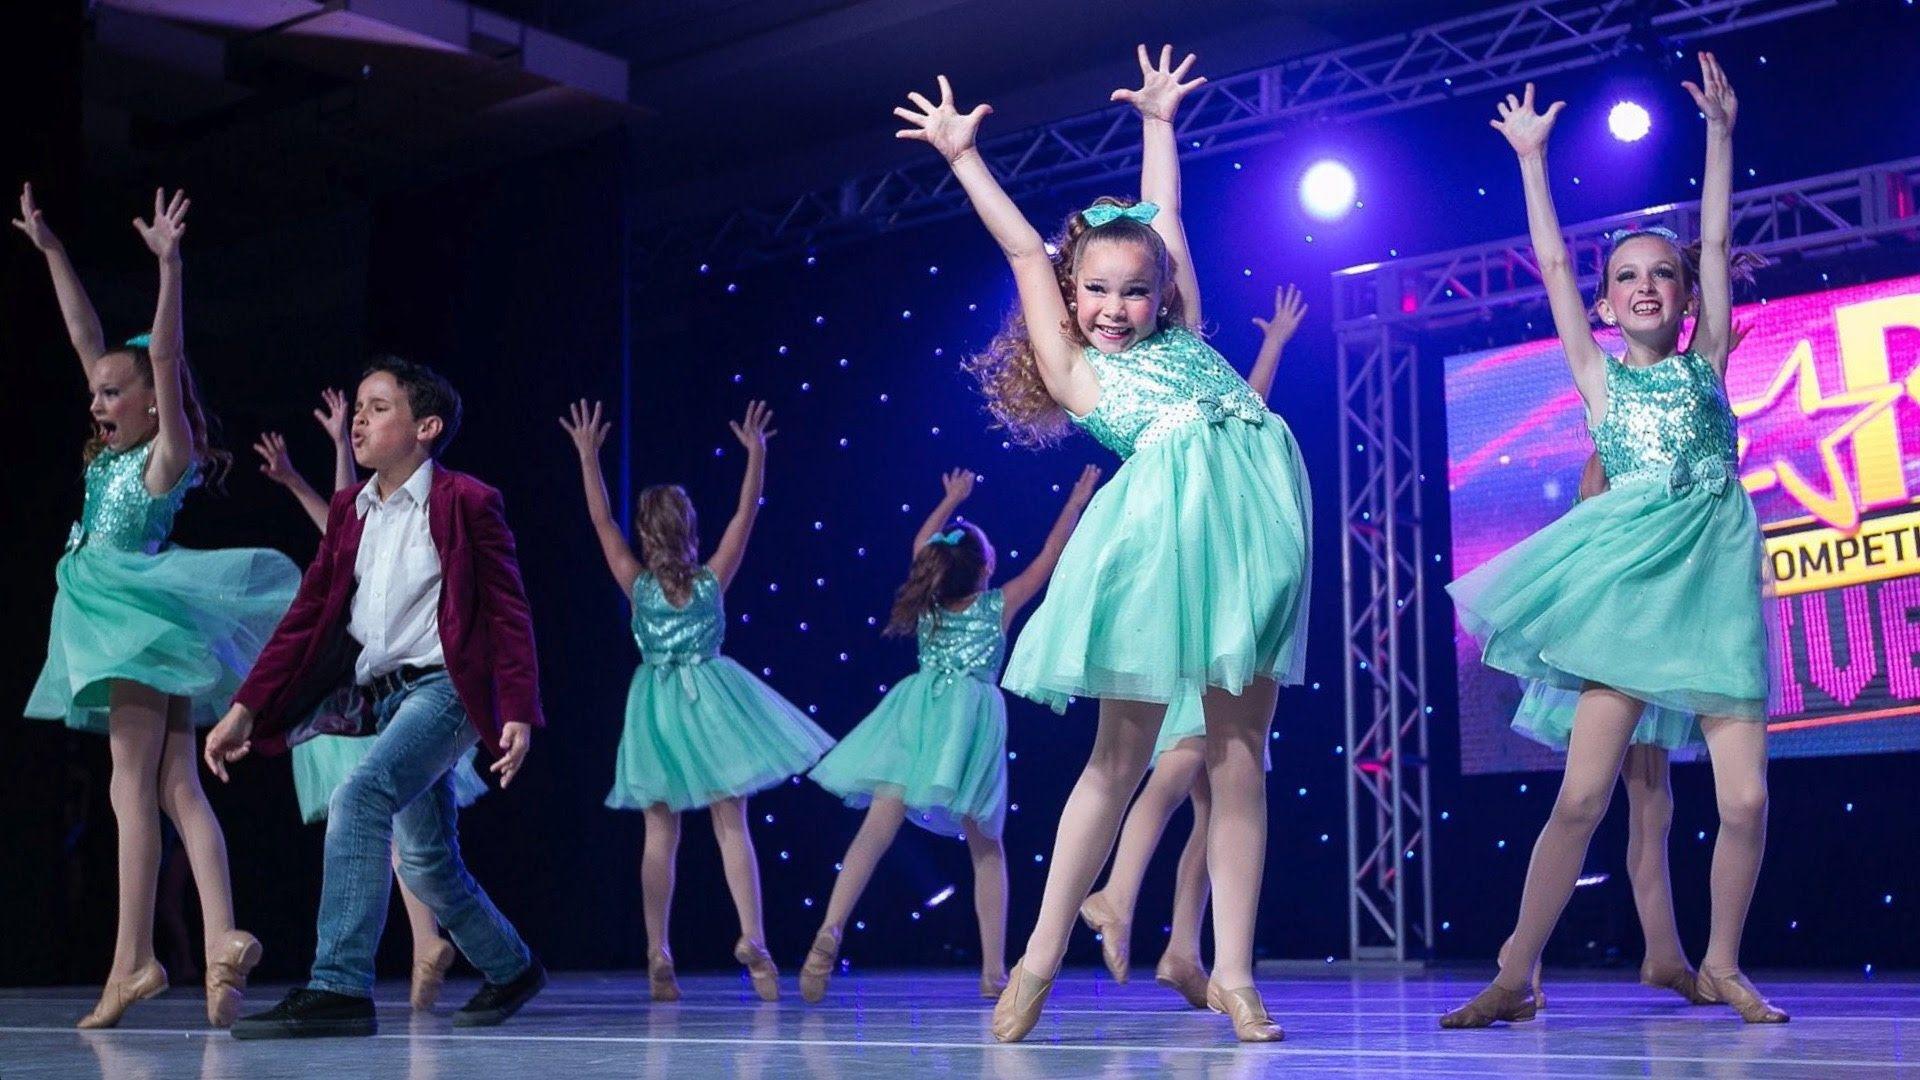 Temecula Dance Company Footloose Footloose Dance Dance Company Dance Costumes Lyrical